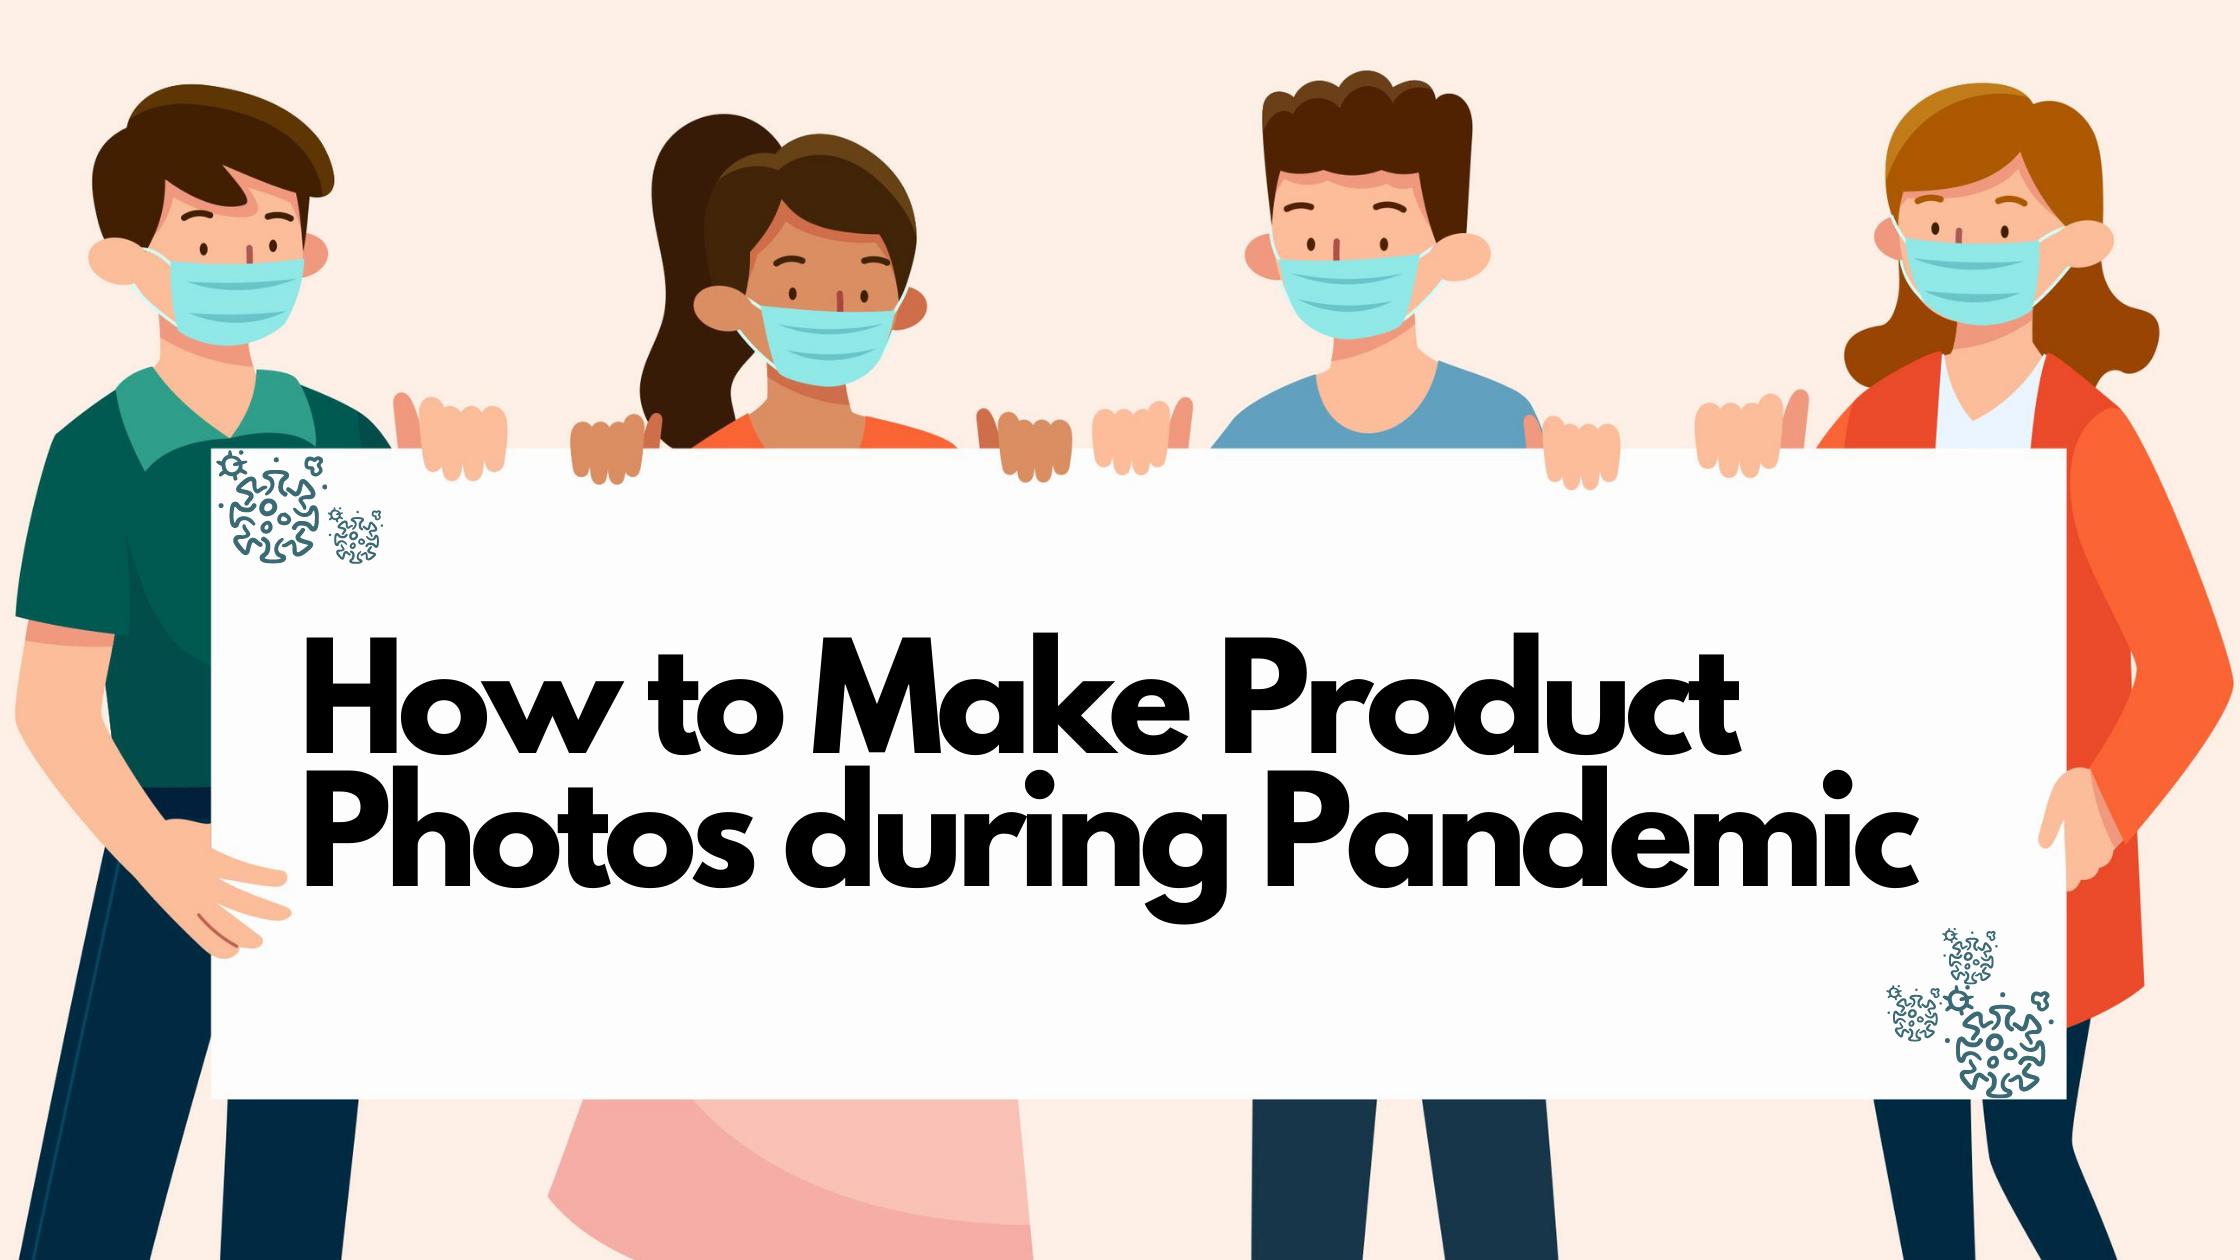 Make Product Photos during Pandemic